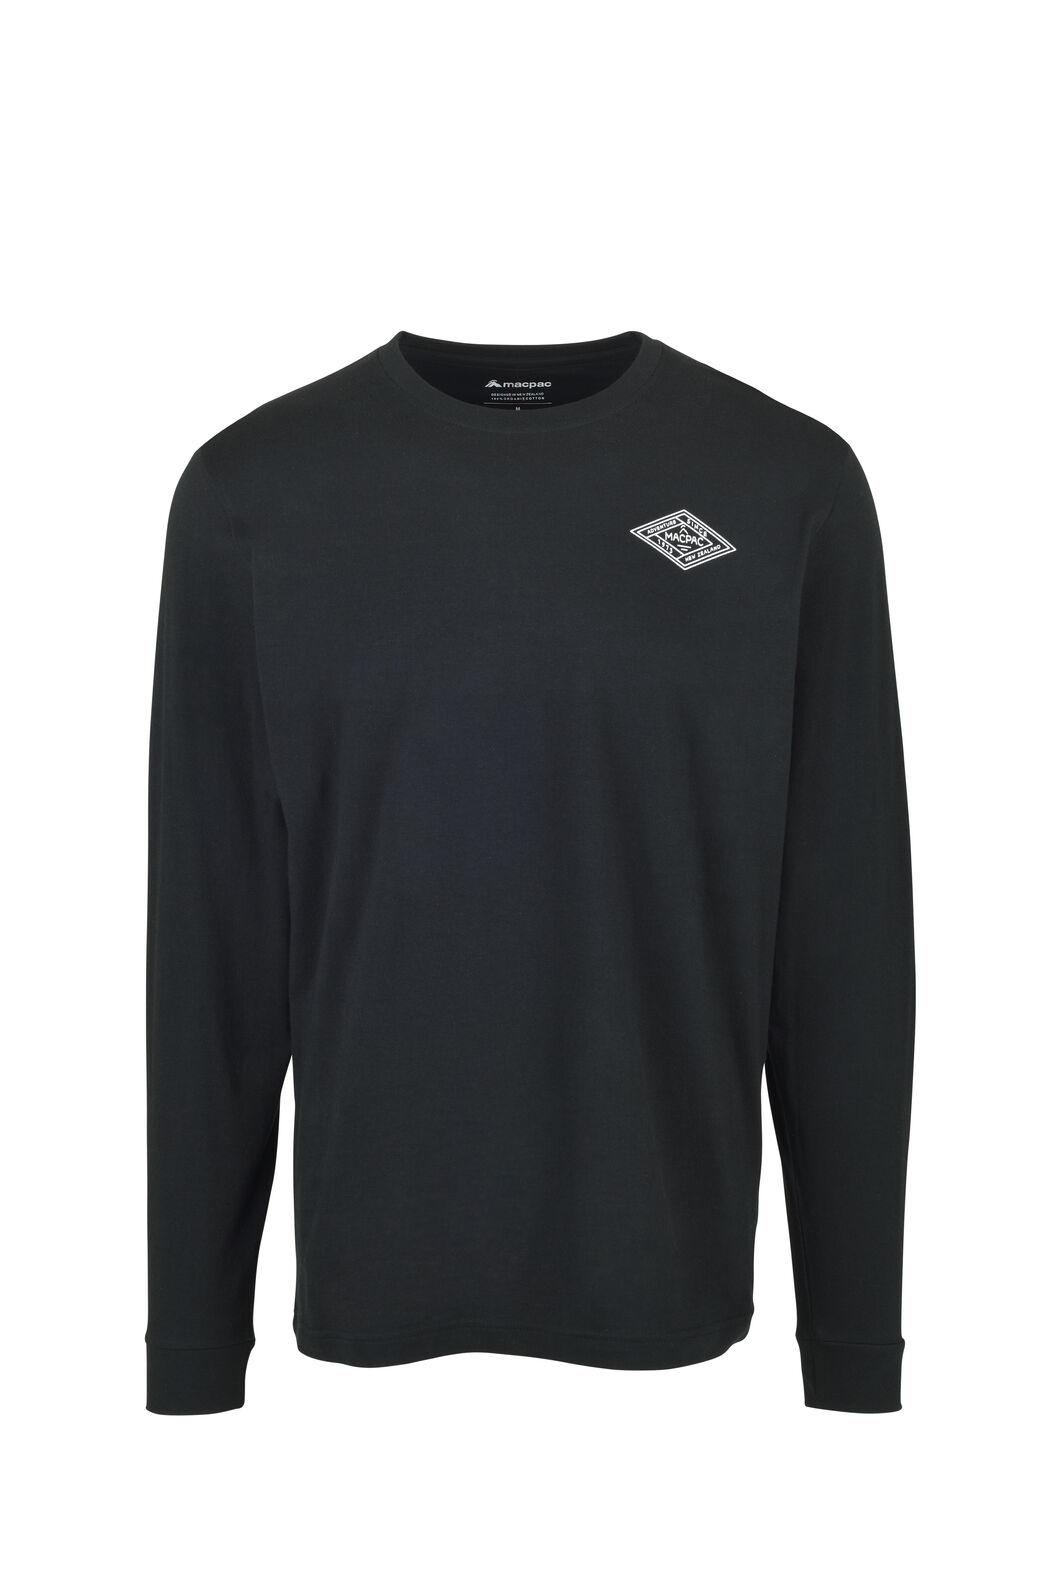 Macpac Diamond Fairtrade Organic Cotton Long Sleeve Tee — Men's, Black, hi-res